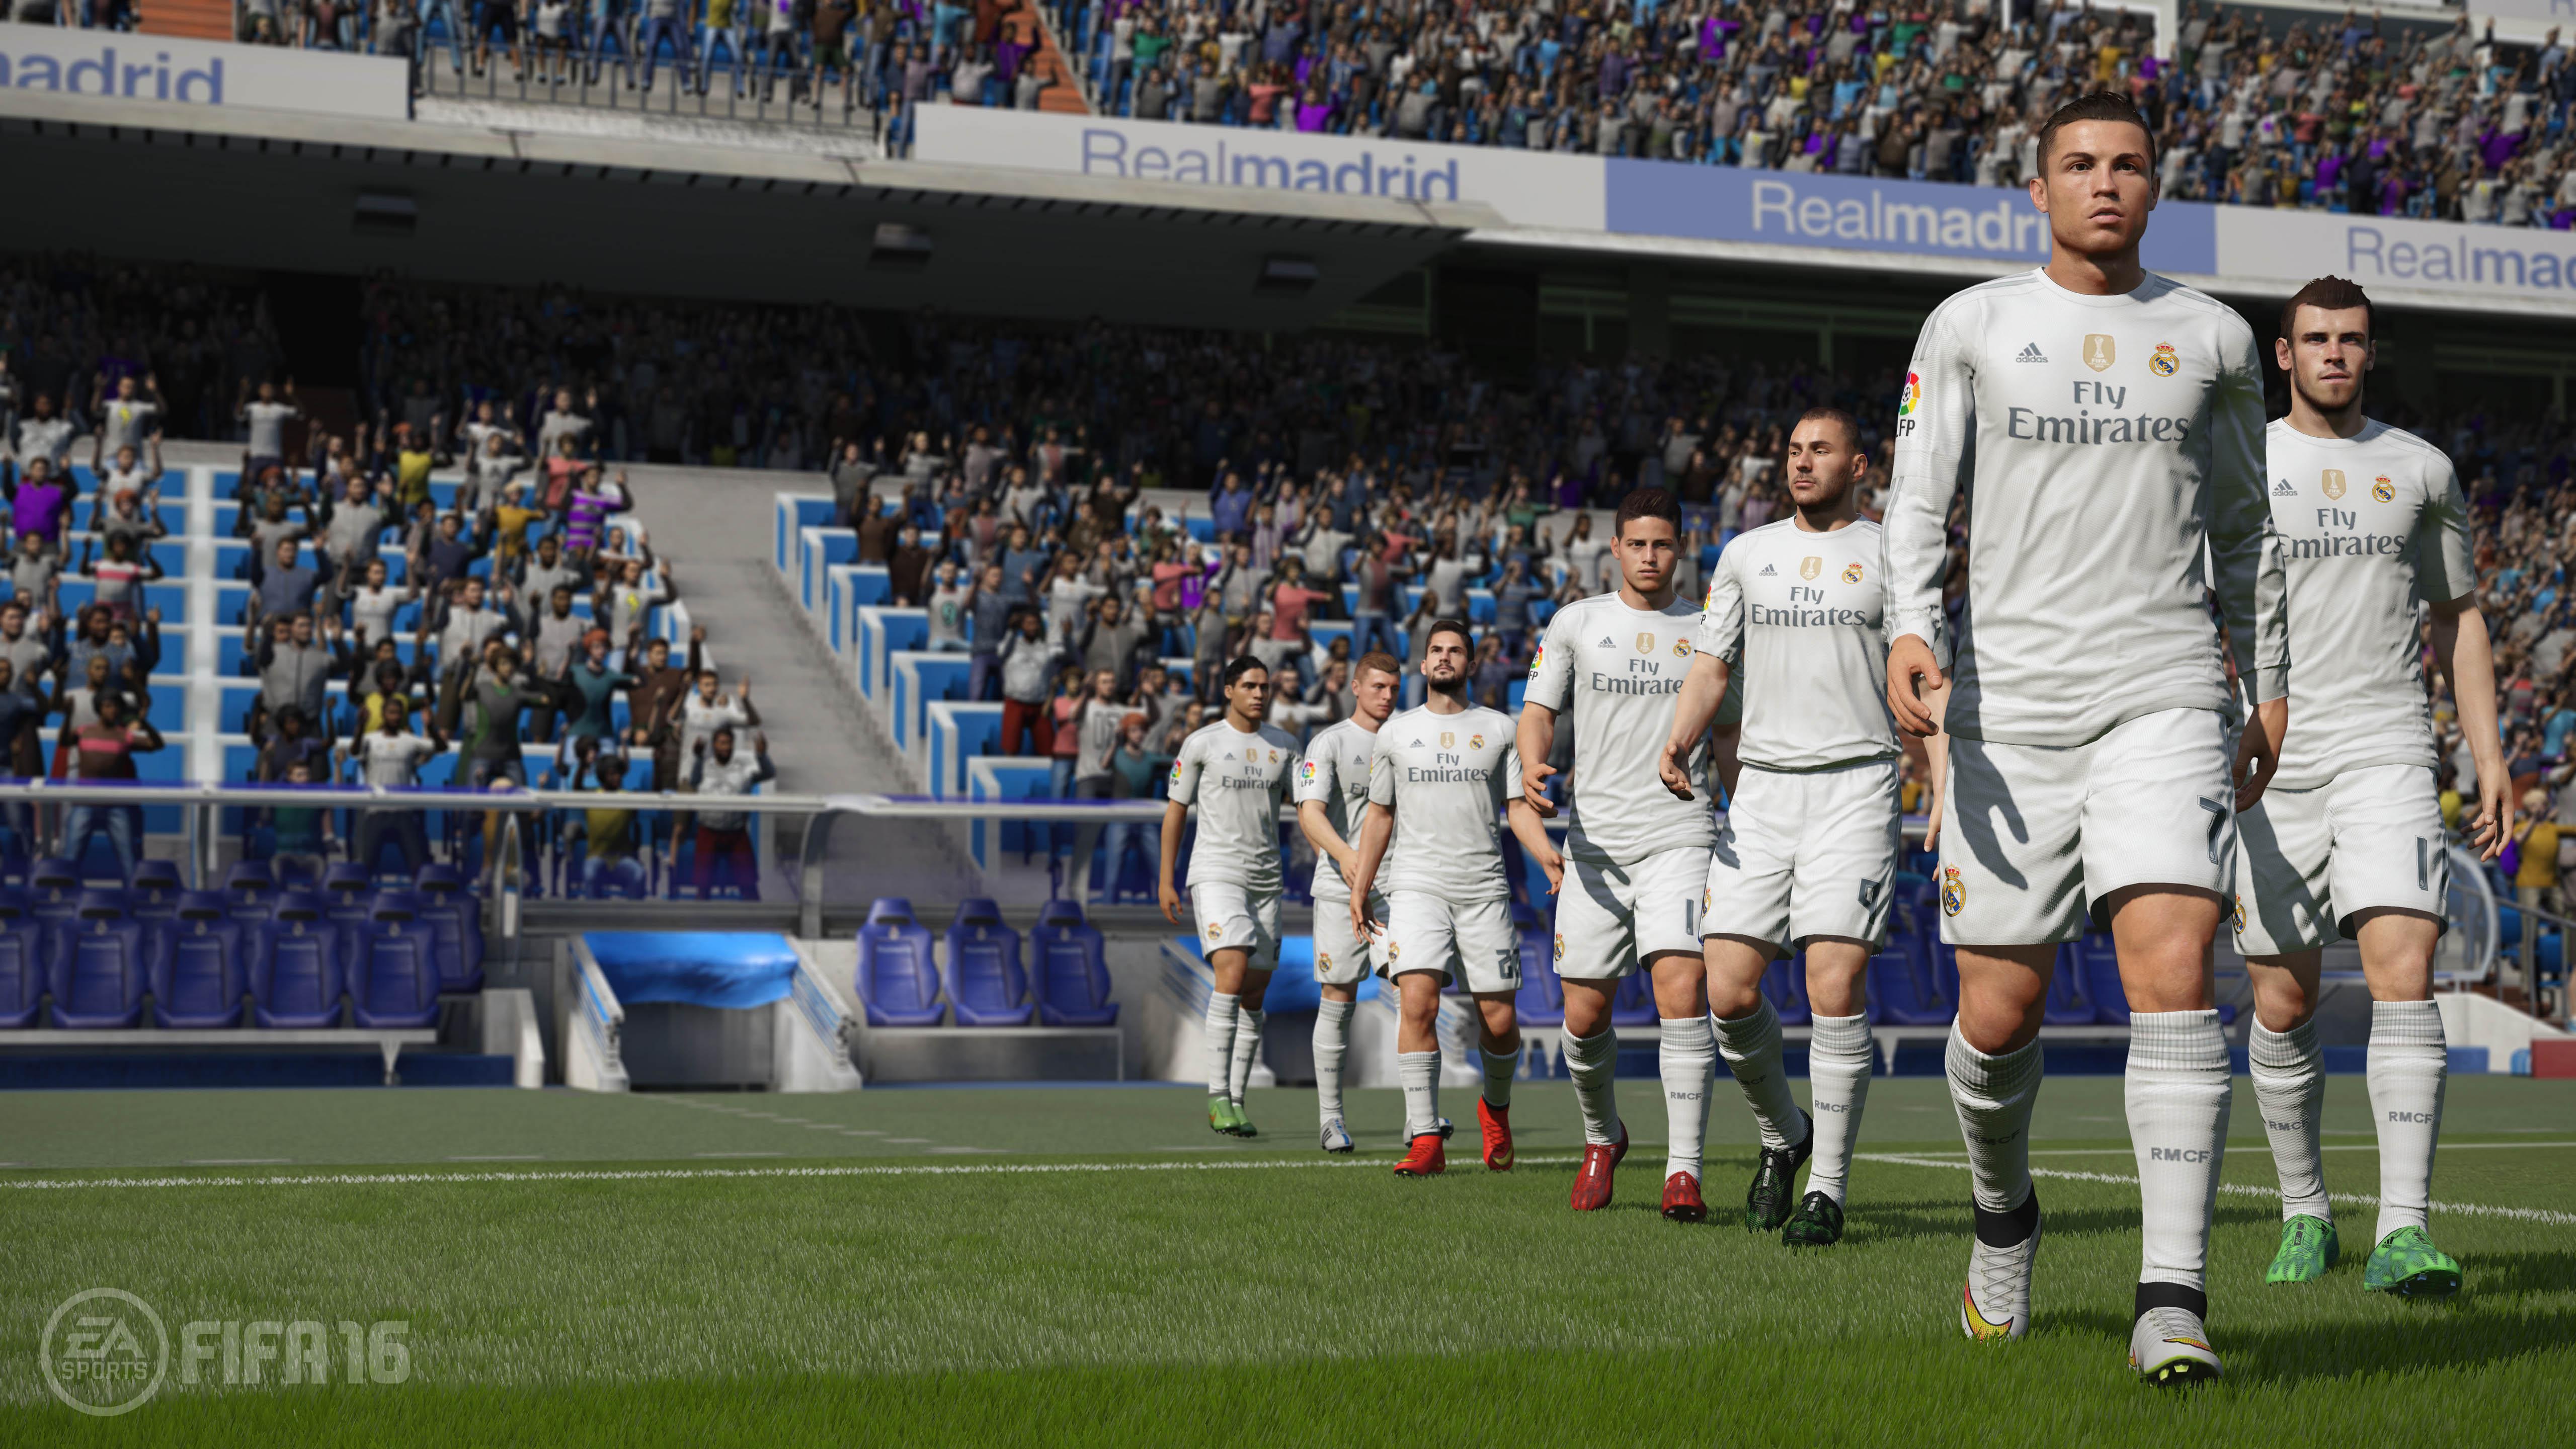 FIFA 16 - Real Madryt